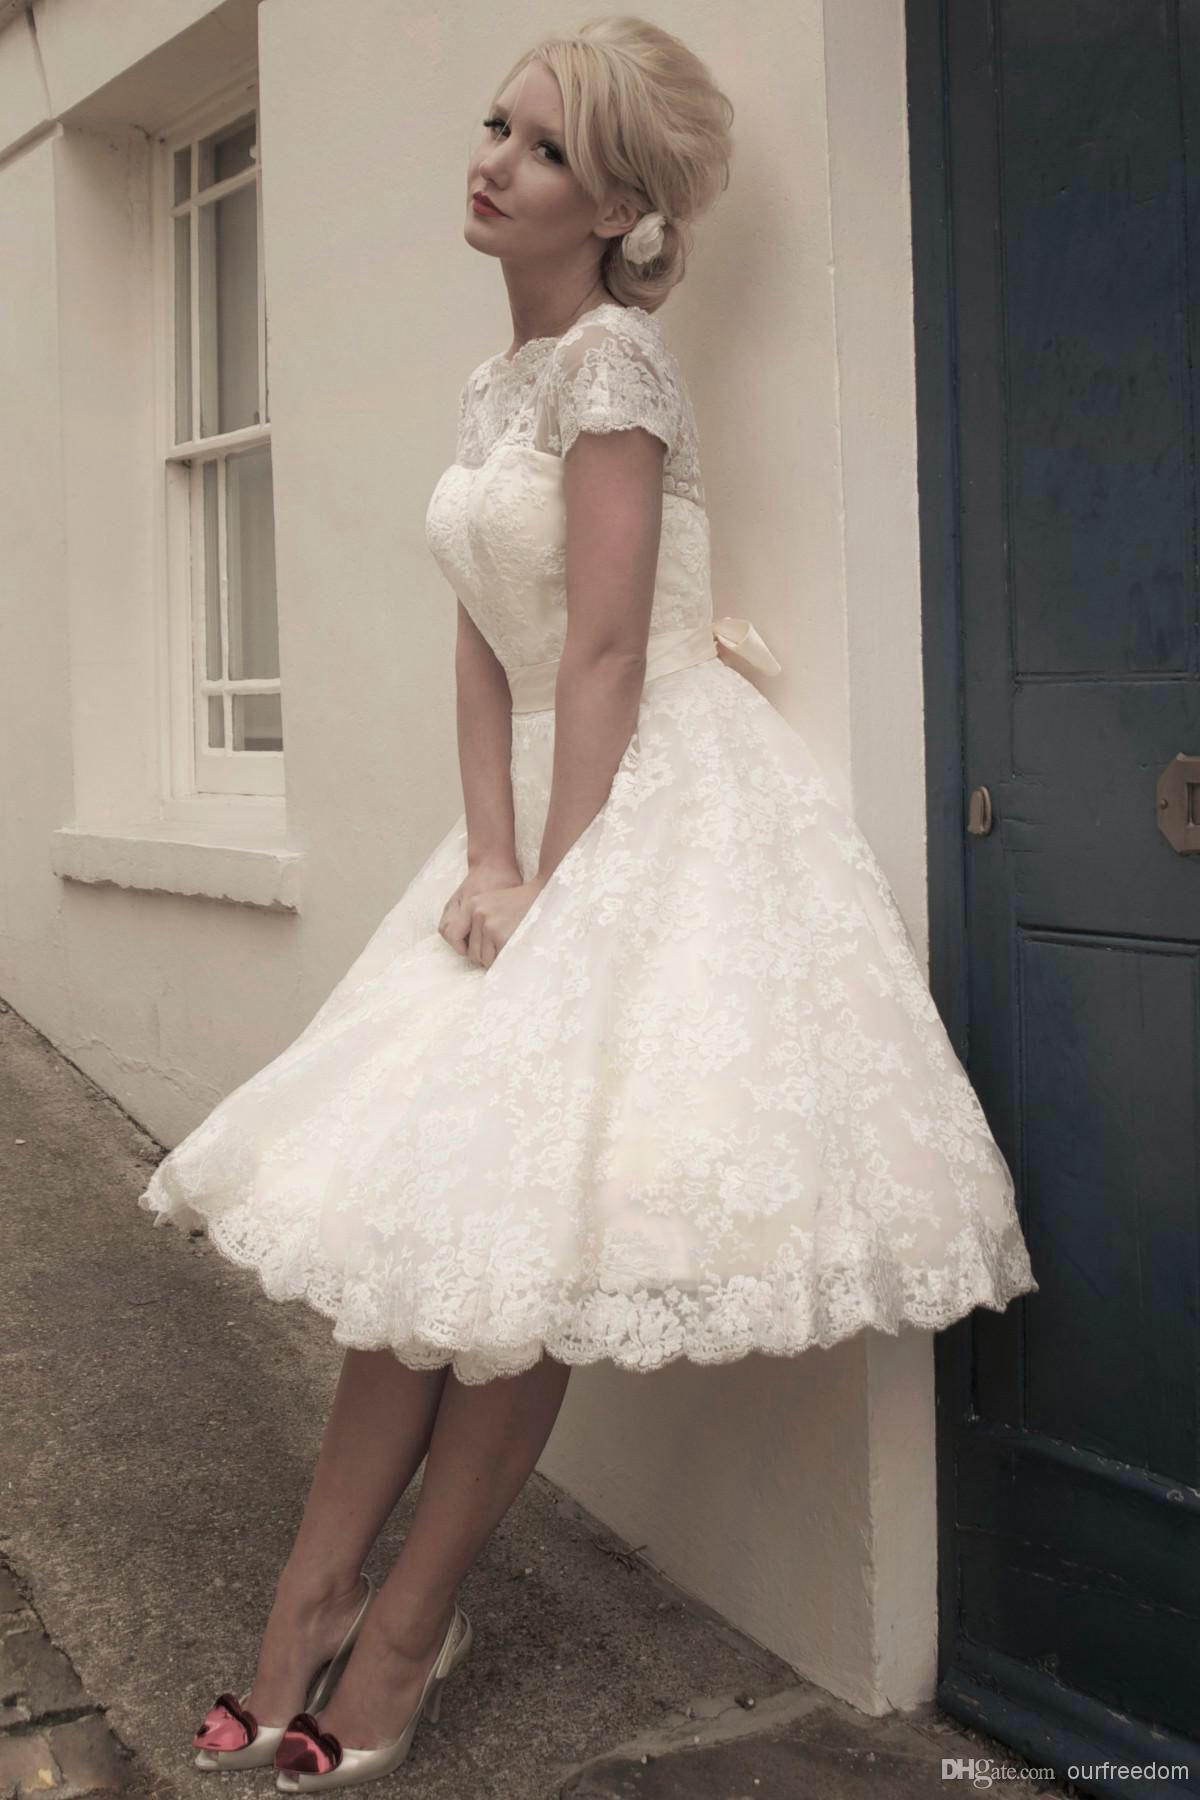 Mooshki wedding pinterest short wedding dresses wedding dress